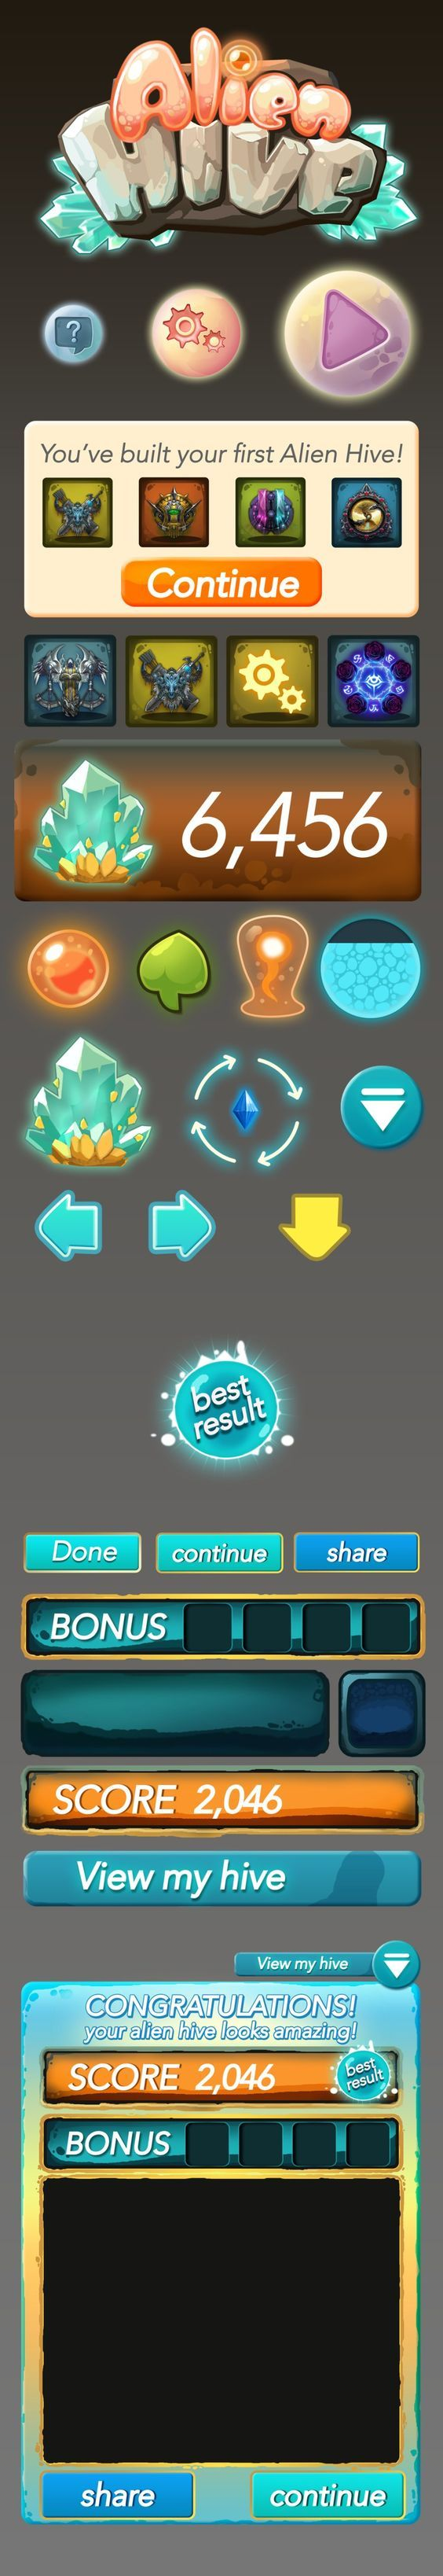 一些手机游戏UI设计 by V唐三藏 on ZCOOL: